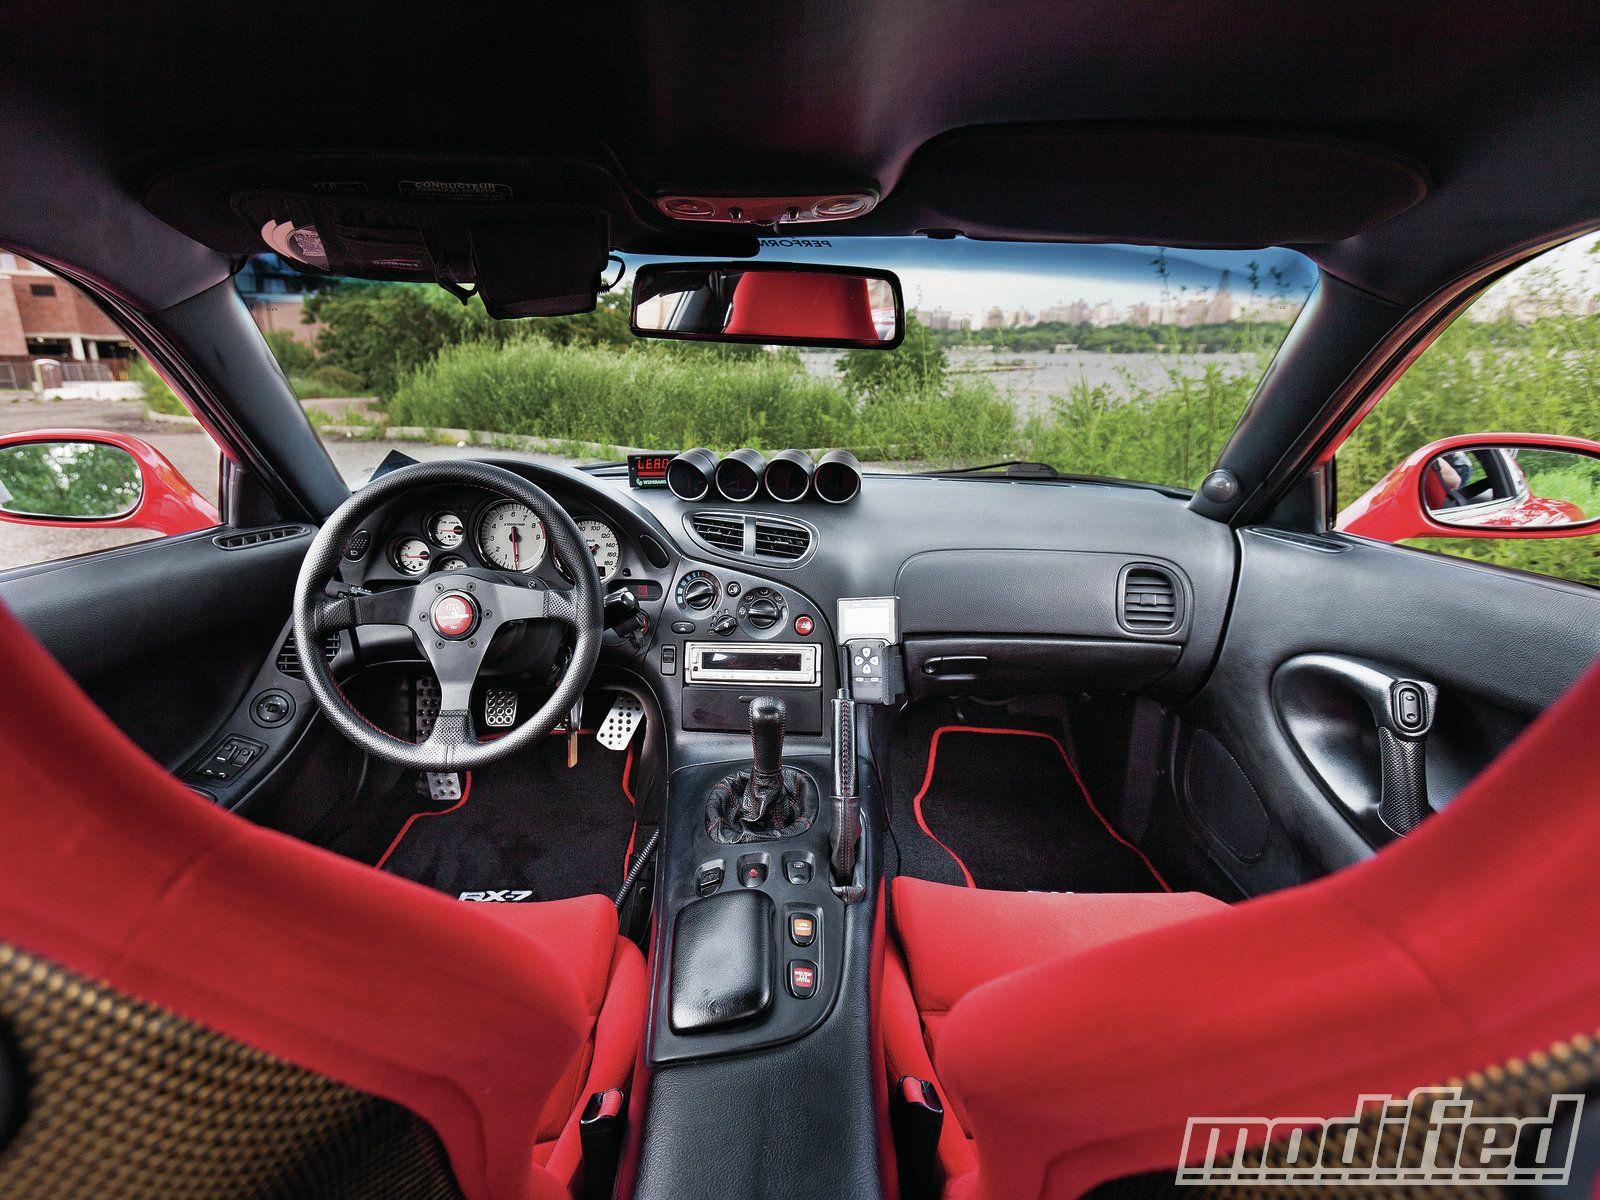 1993 Mazda RX-7 High